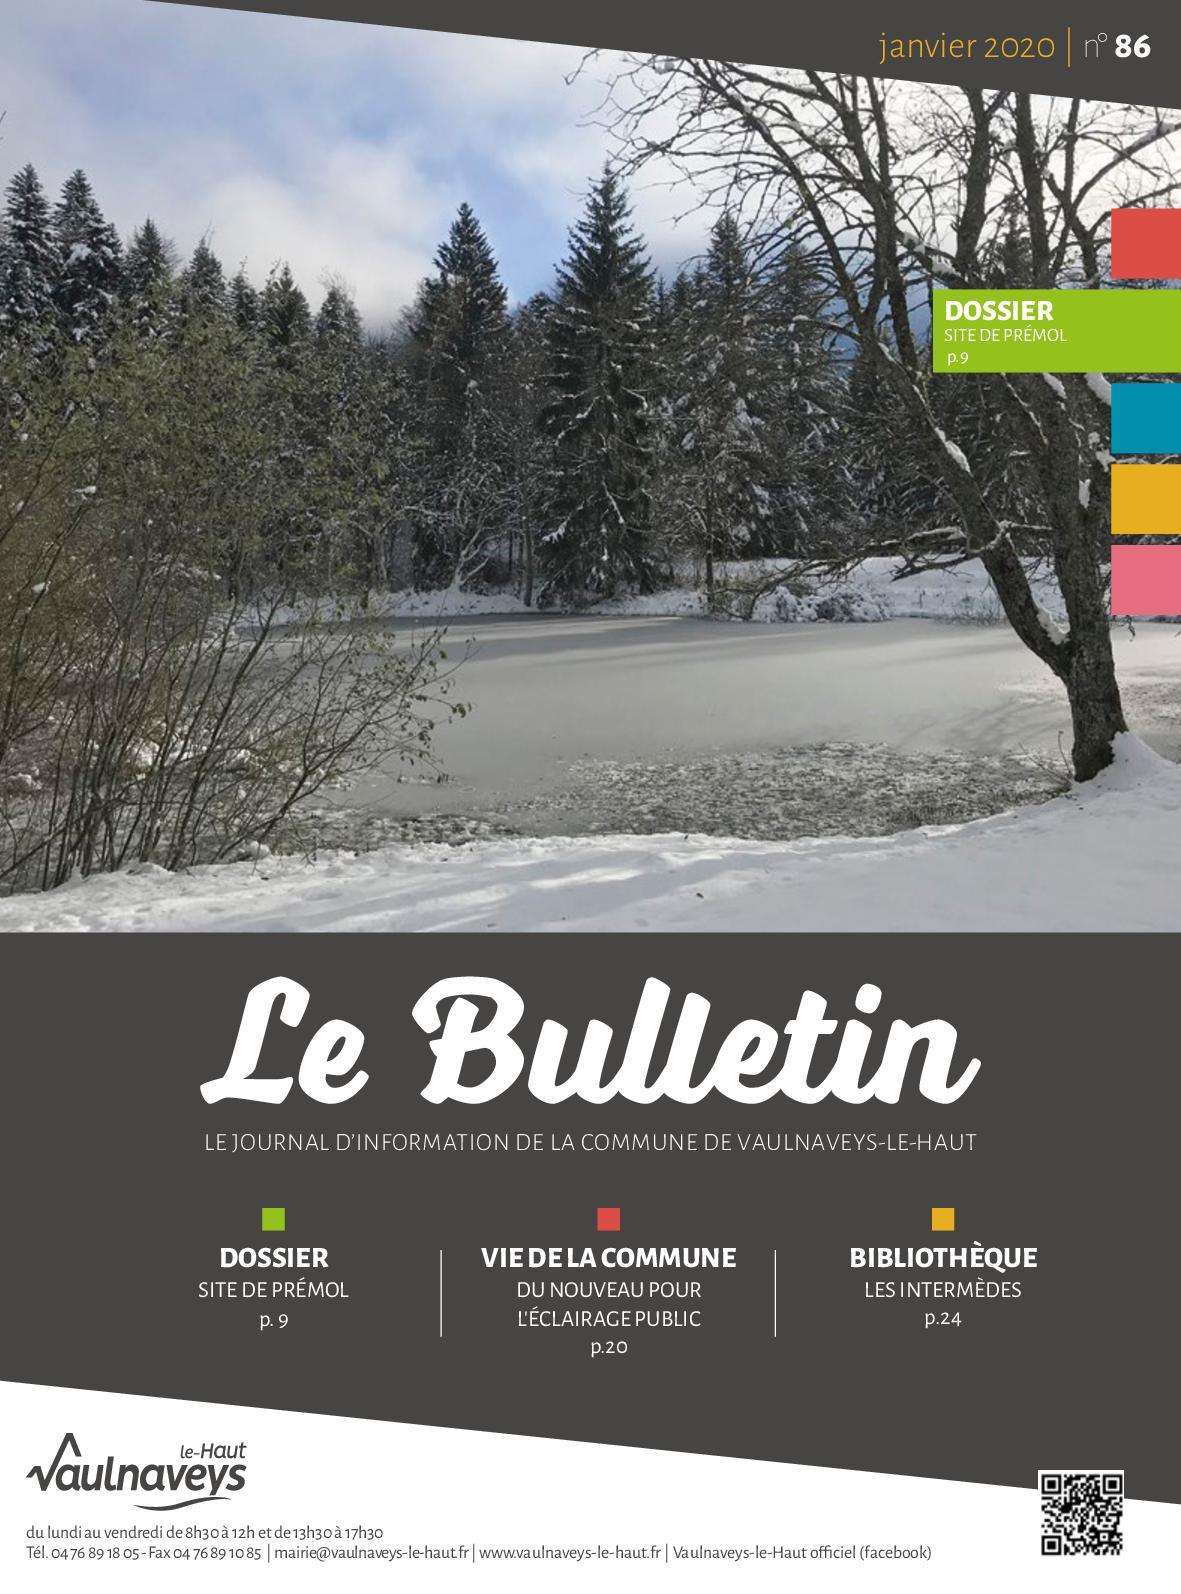 Bibliothèque Saint Martin D Uriage calaméo - bulletin municipal 86 janiver 2020 vaulnaveys-le-haut